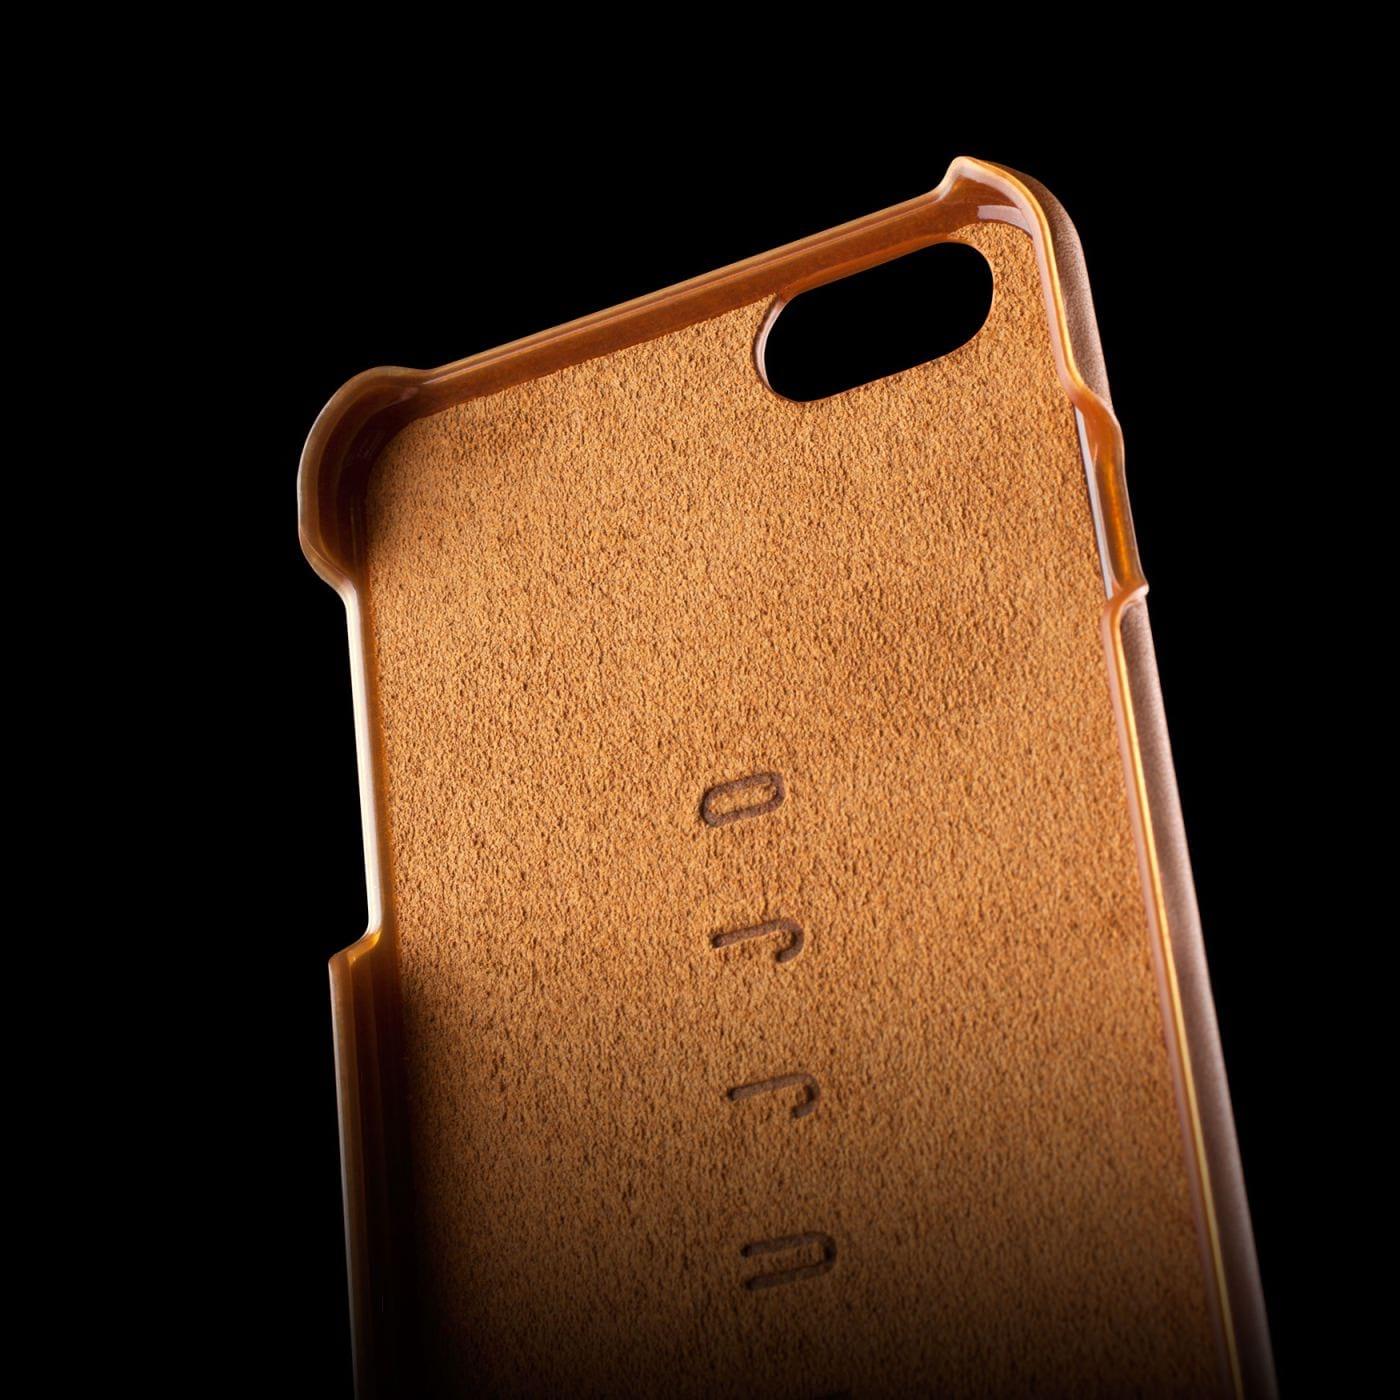 Leather Wallet Case 80⁰ for iPhone 6 6S Plus (Tan) - Mujjo 09ec7b551bfa5